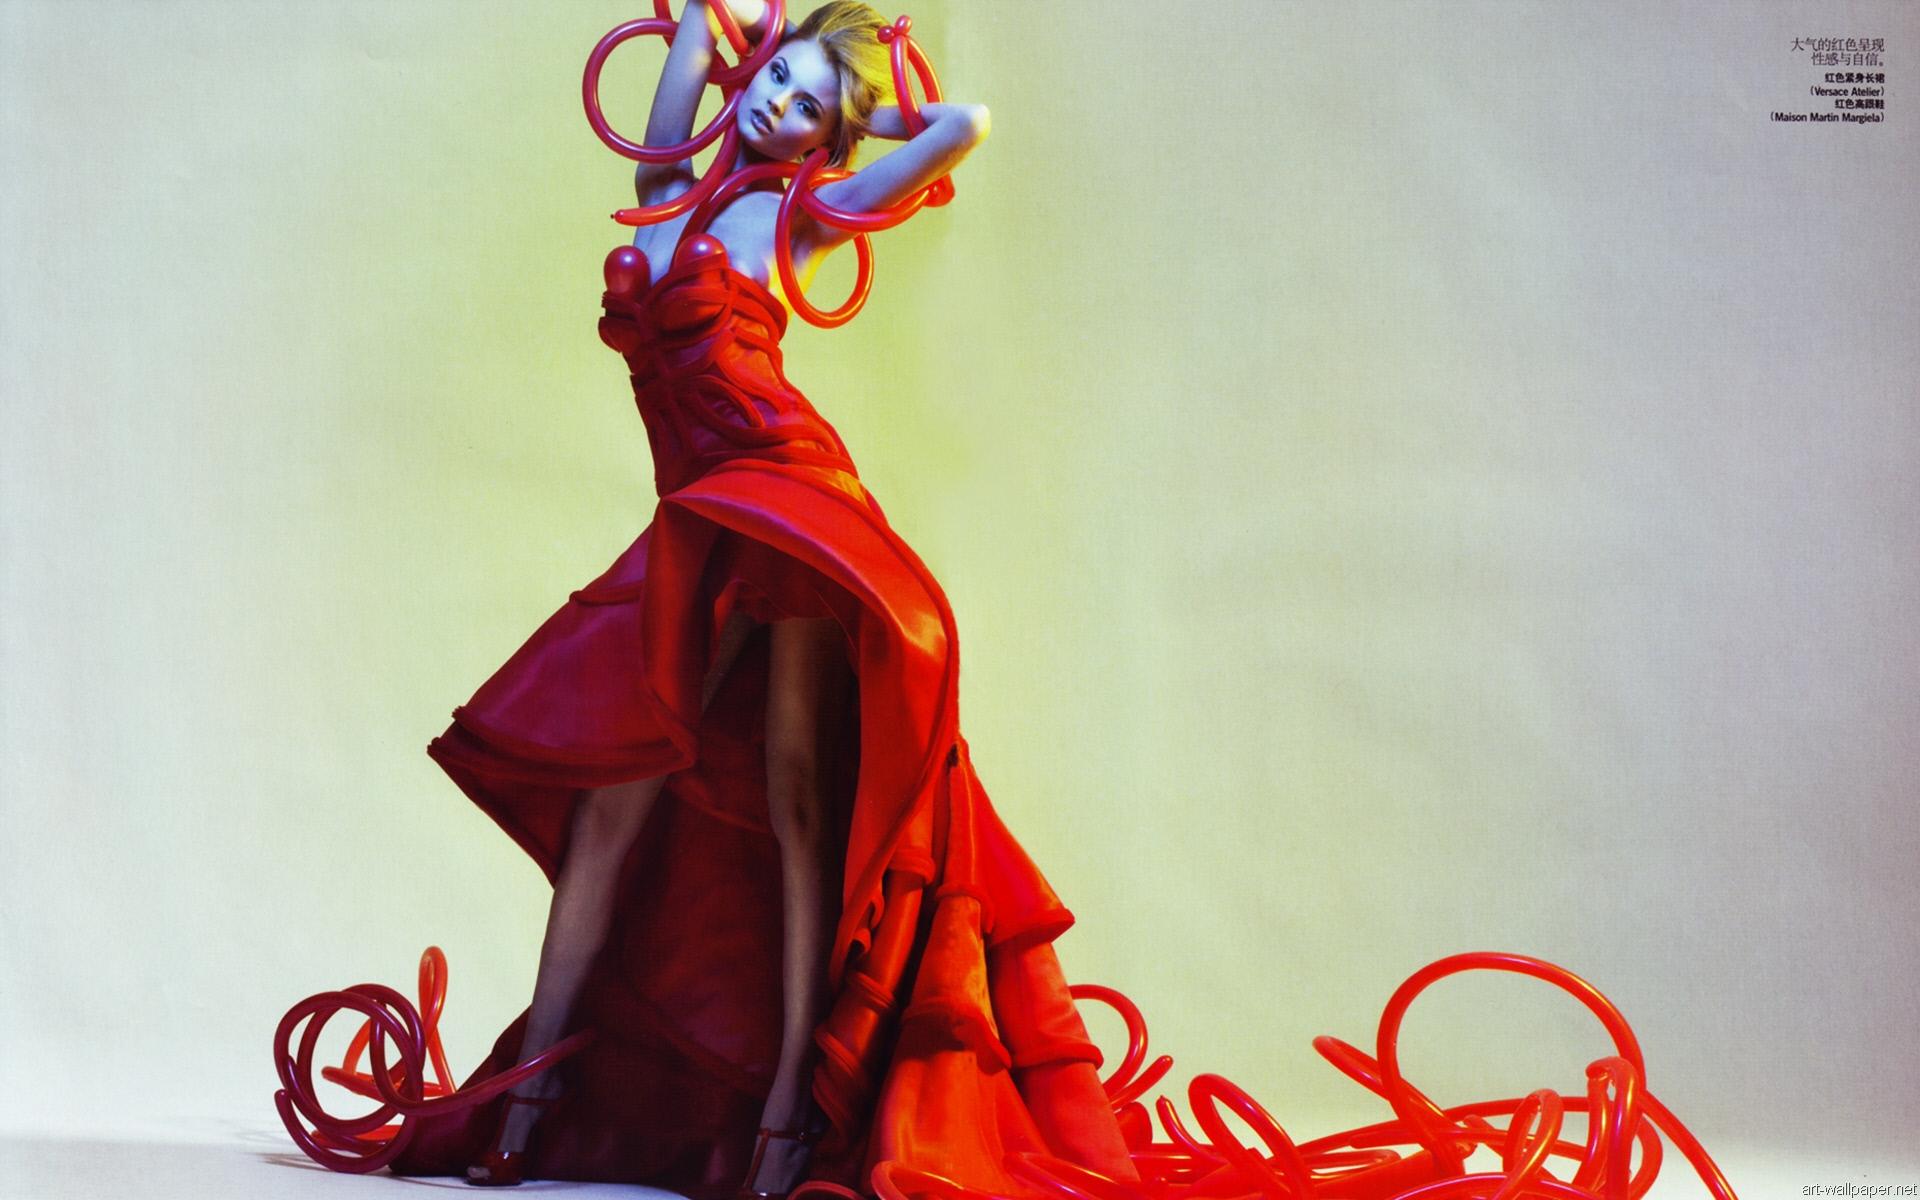 Fashion hd wallpaper wallpapersafari - Is wallpaper in style ...